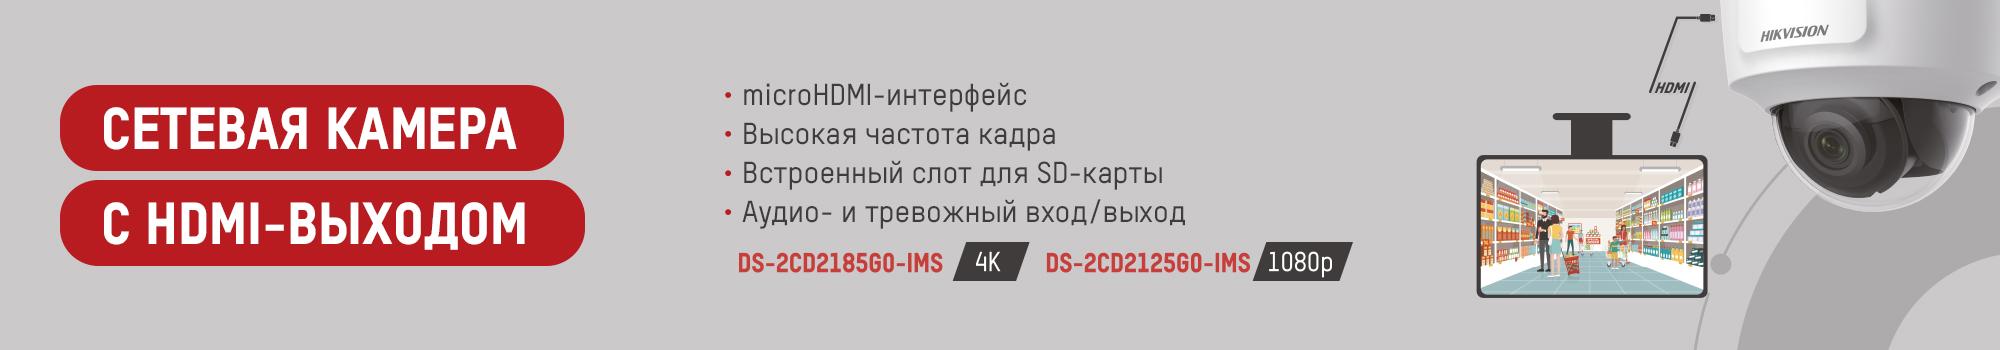 banner-hd-2000x350